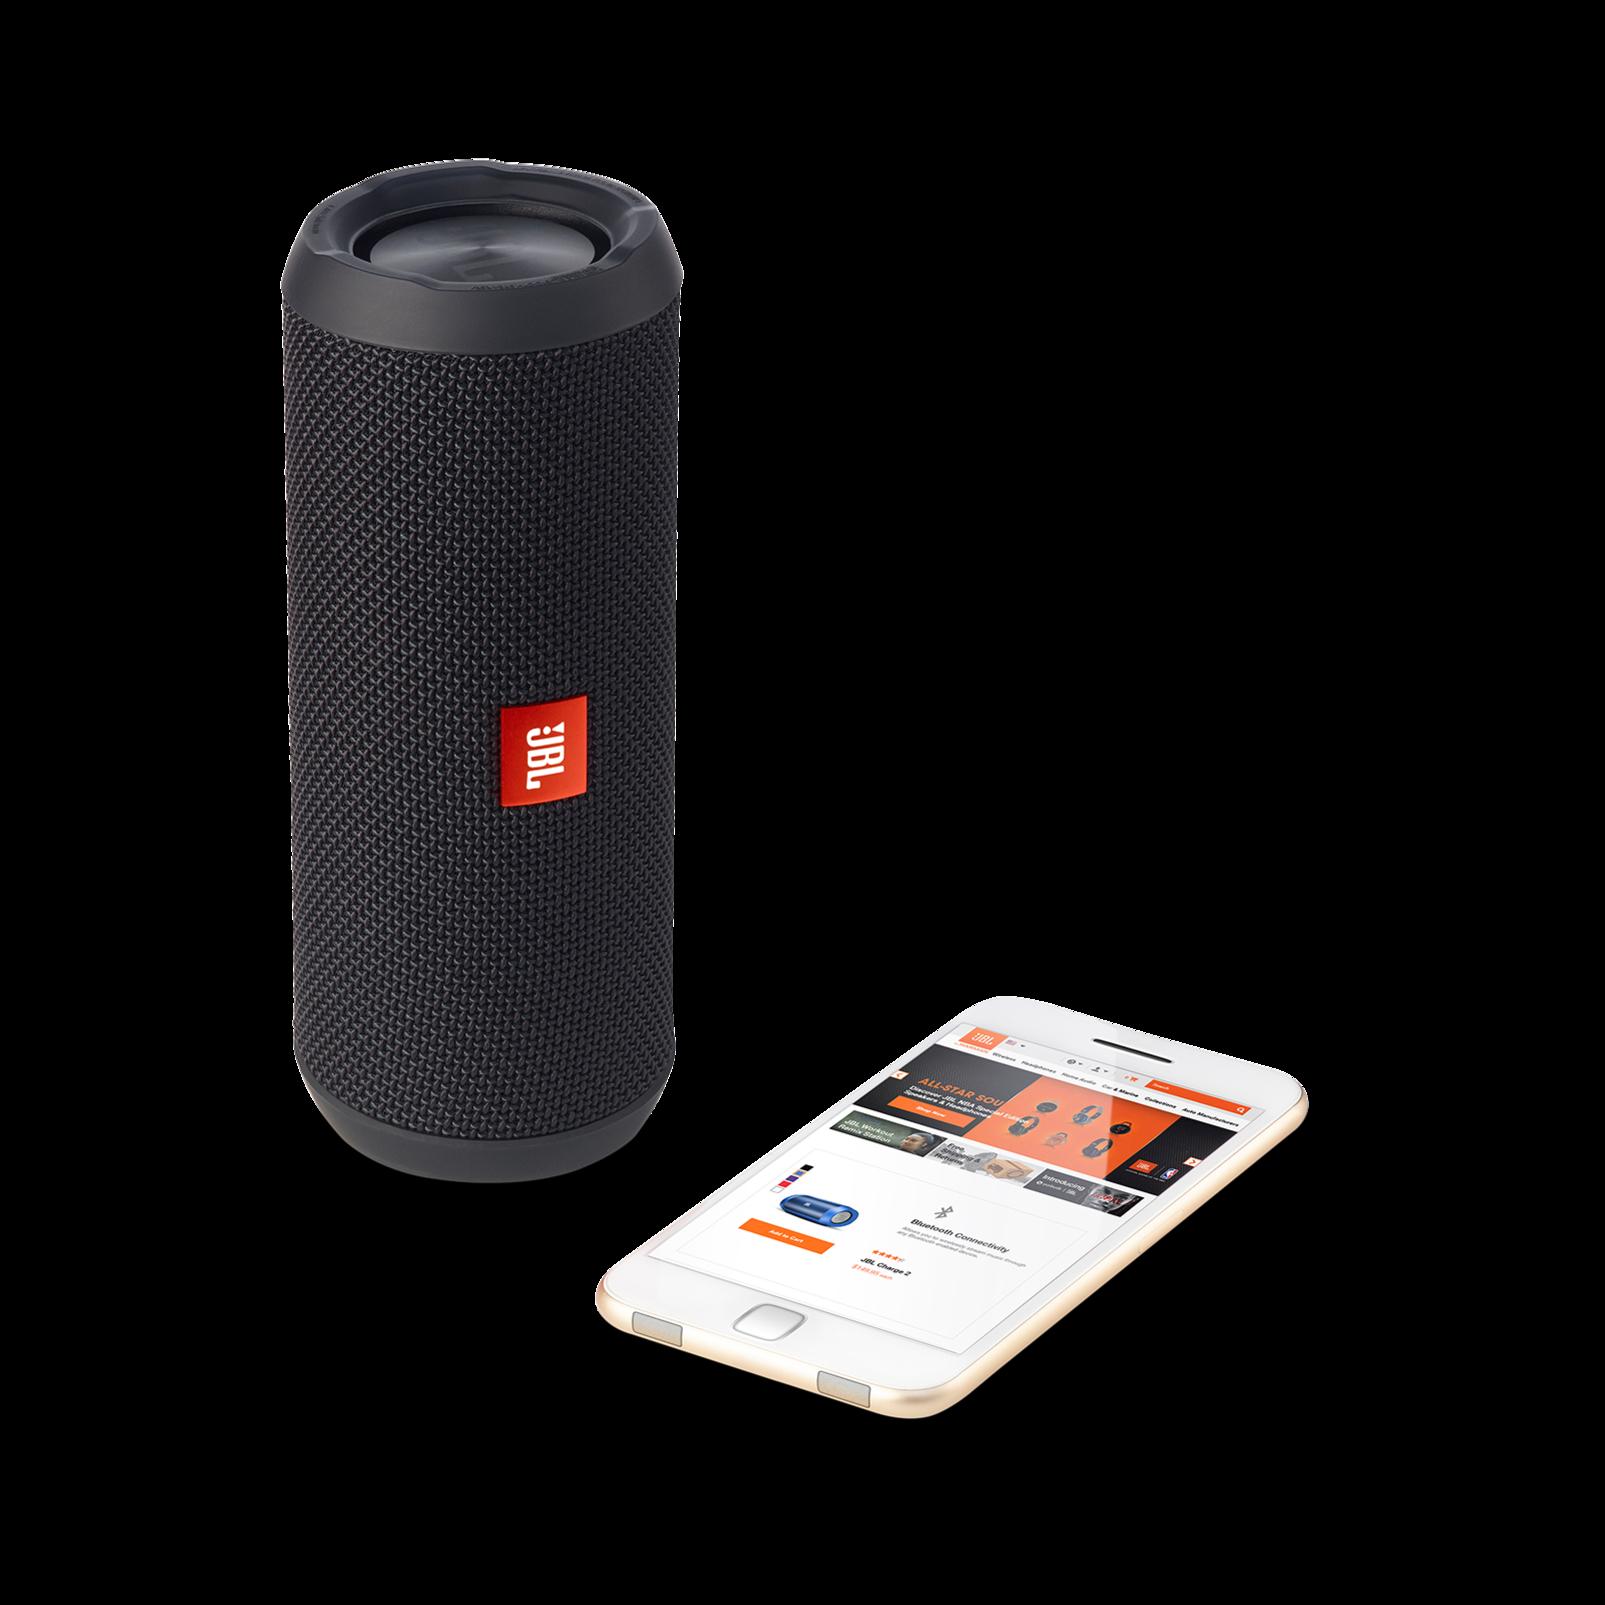 JBL Flip 3 - Black - Splashproof portable Bluetooth speaker with powerful sound and speakerphone technology - Detailshot 1